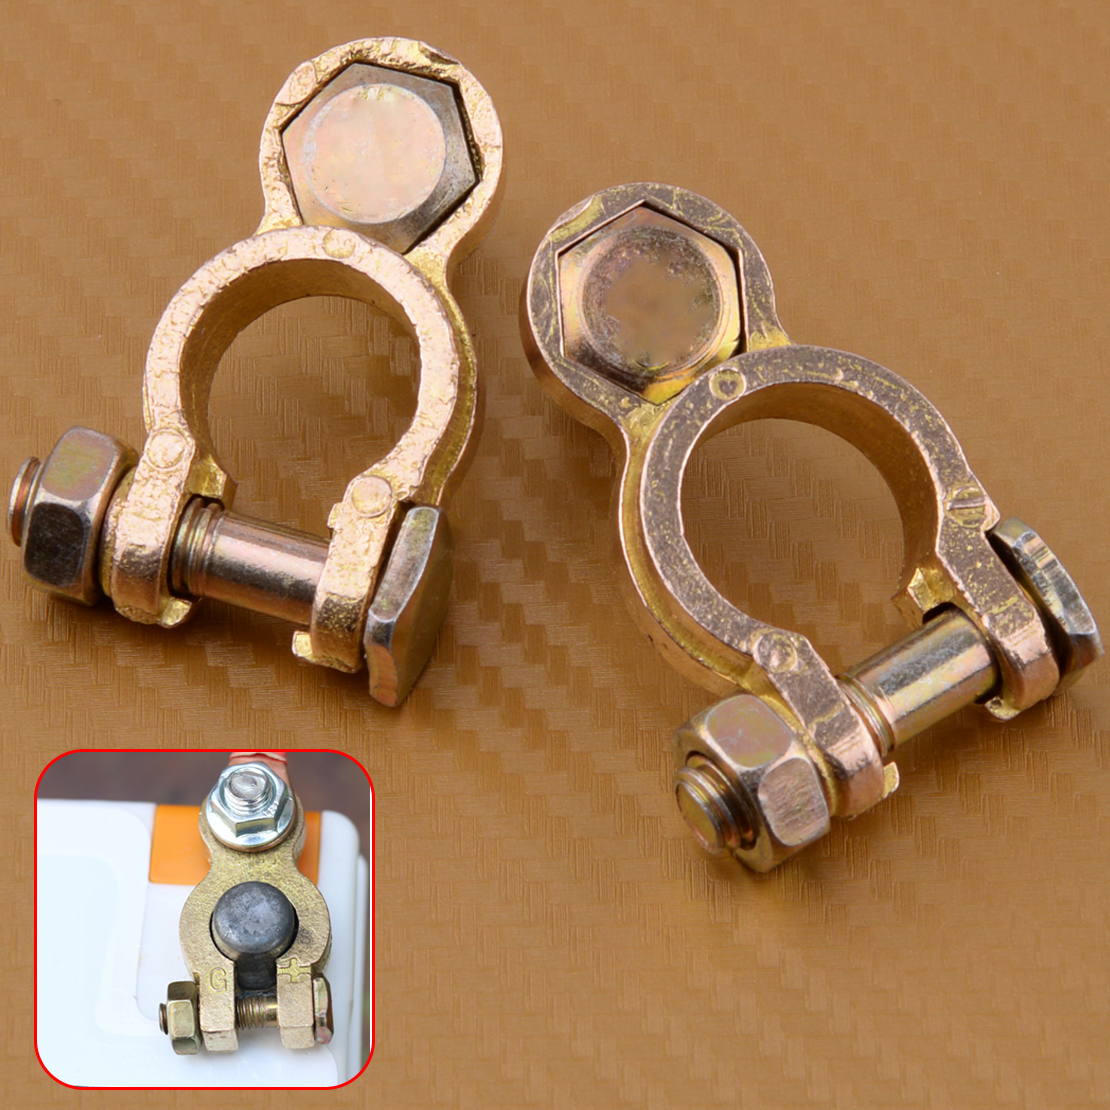 beler Positive & Negative 2pcs Battery Copper Terminal Pile Head Clamp Clips Connector